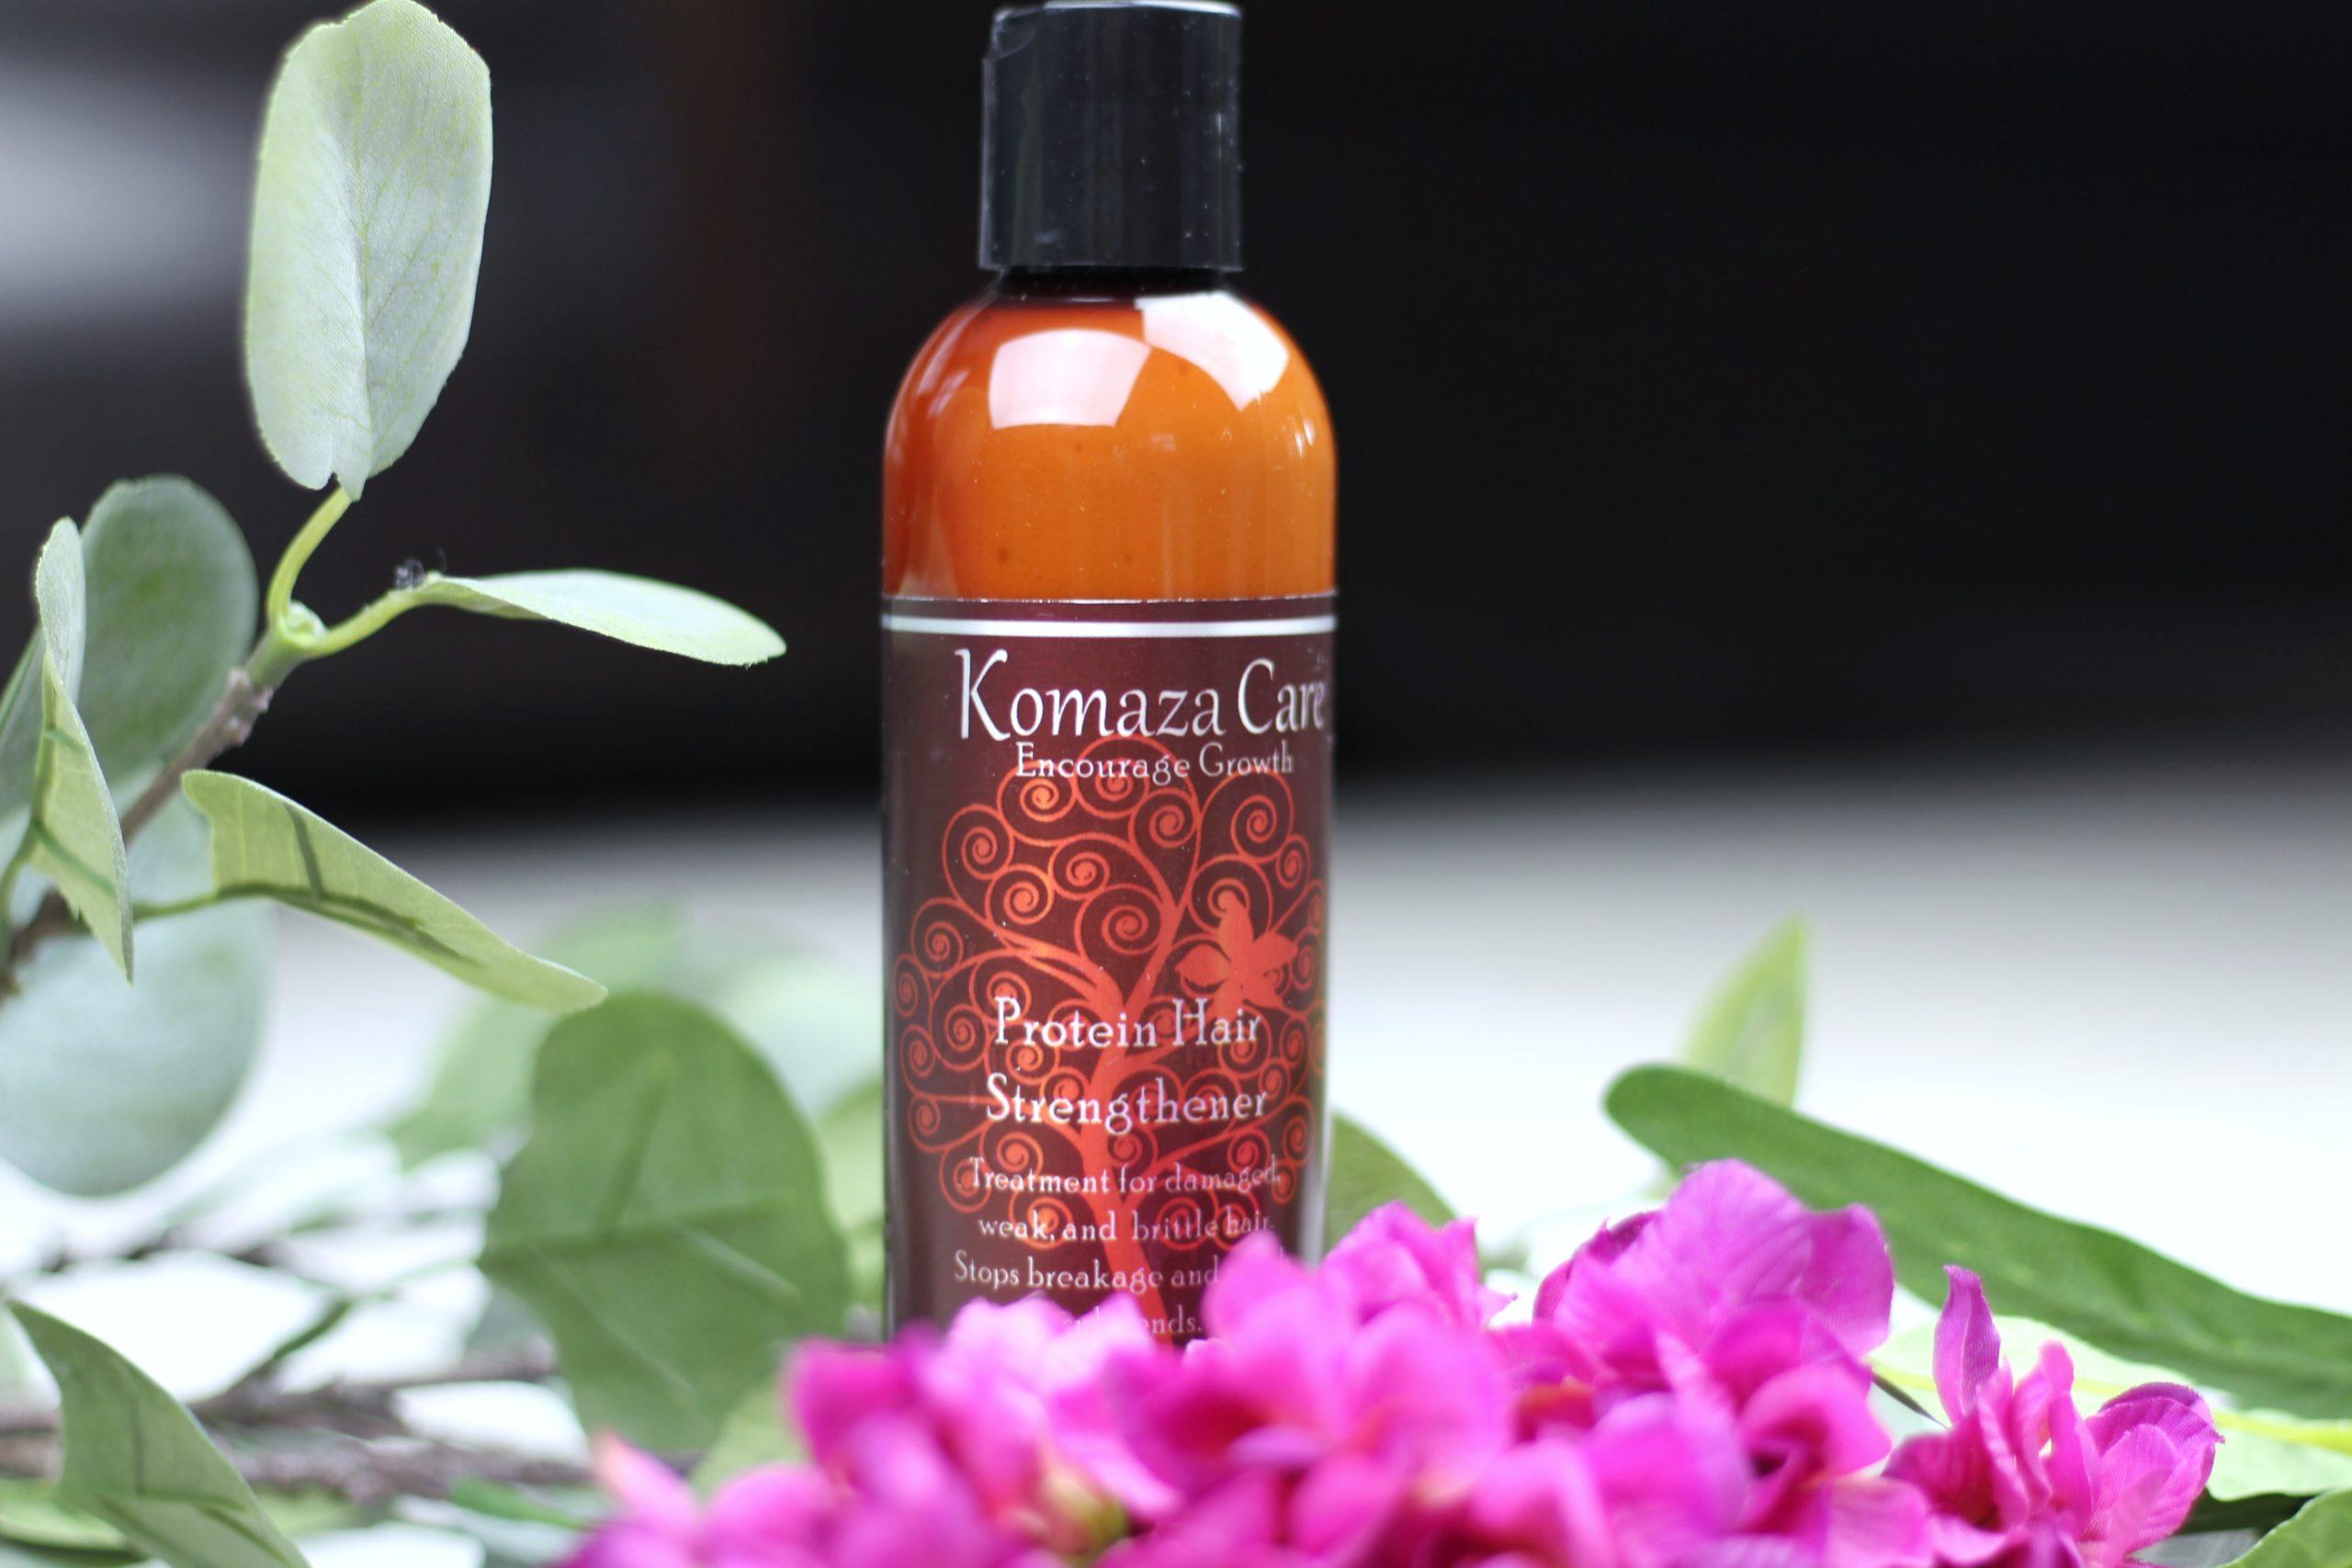 Komaza Hair Care Protein Hair Strengthener